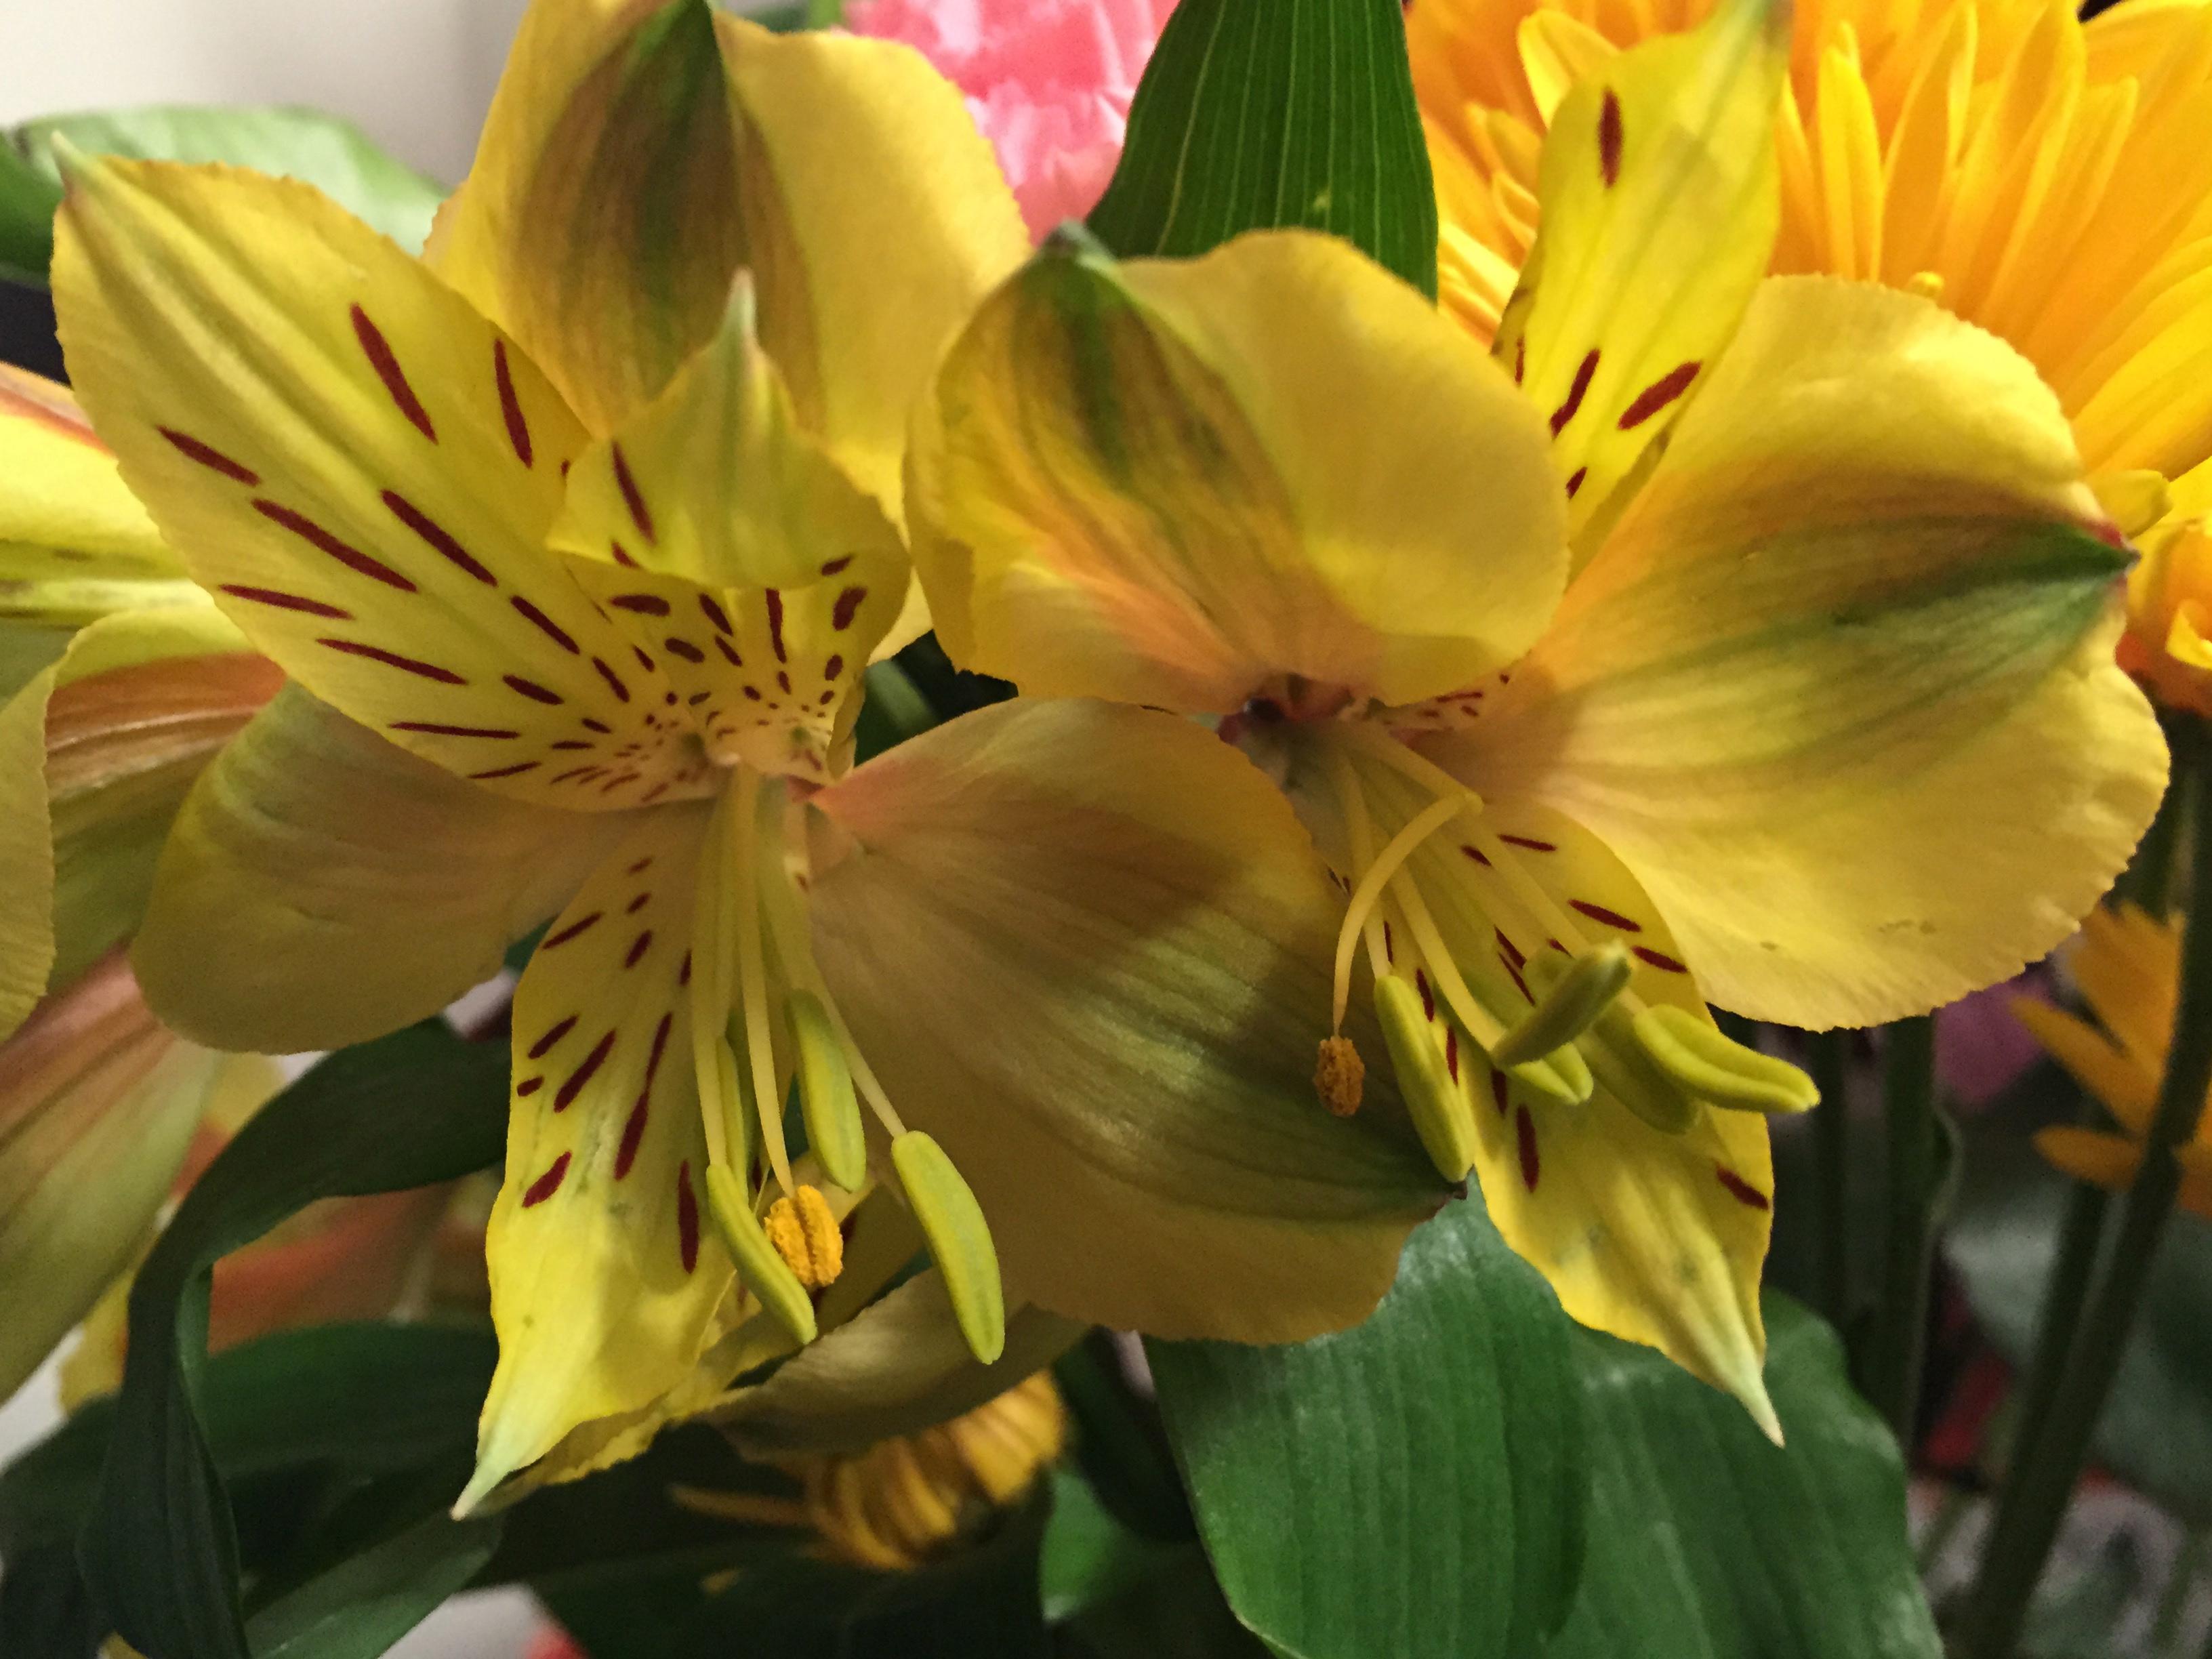 Fresh Cut Flowers for the Week